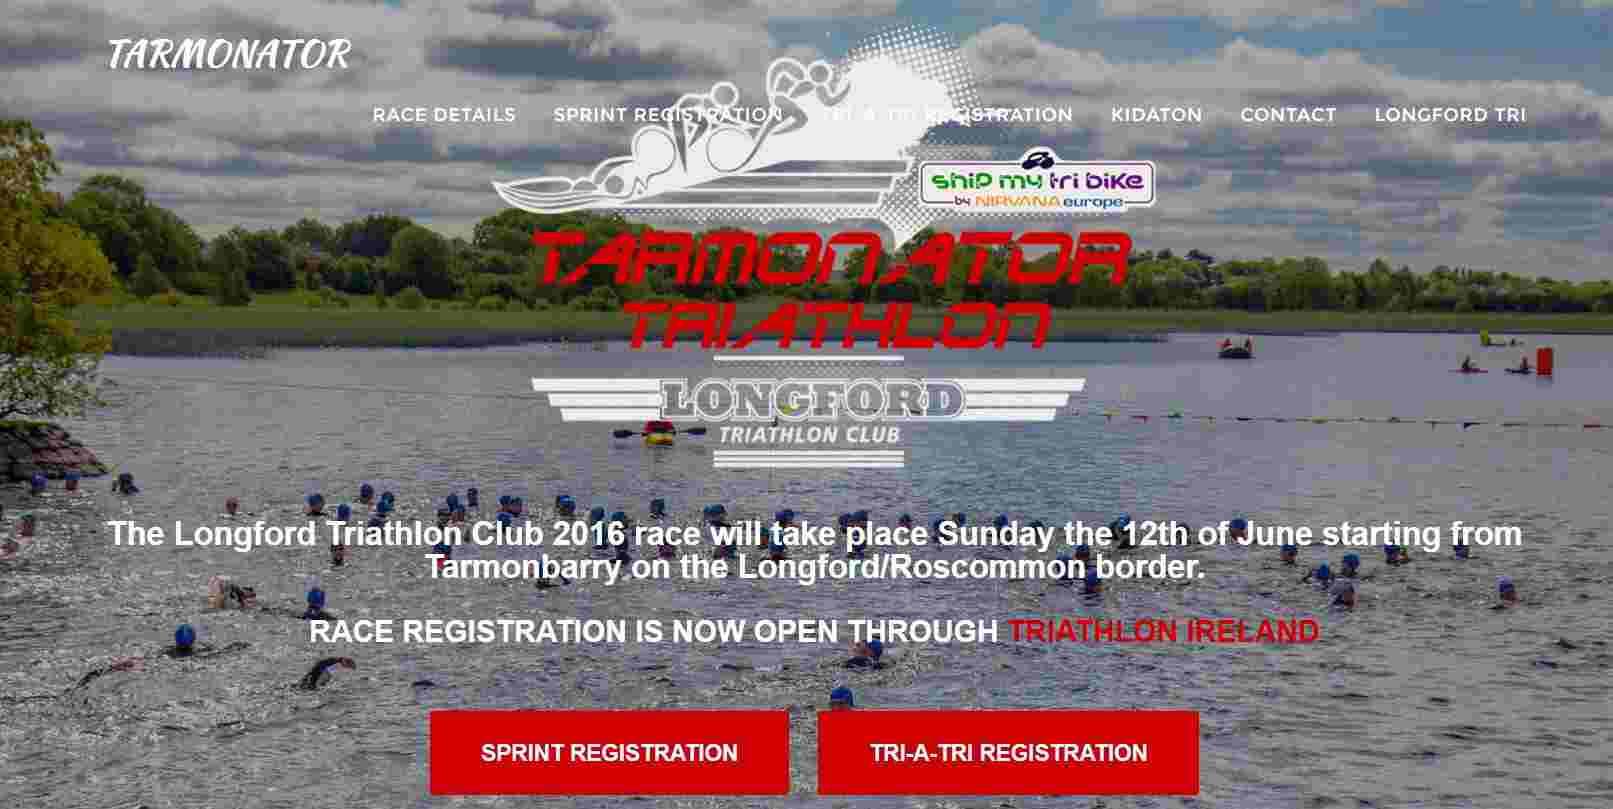 Tarmonator Triathlon 2016 - Longford Triathlon Club; click to Longford tri Ireland Tarmonator-Triathlon-2016